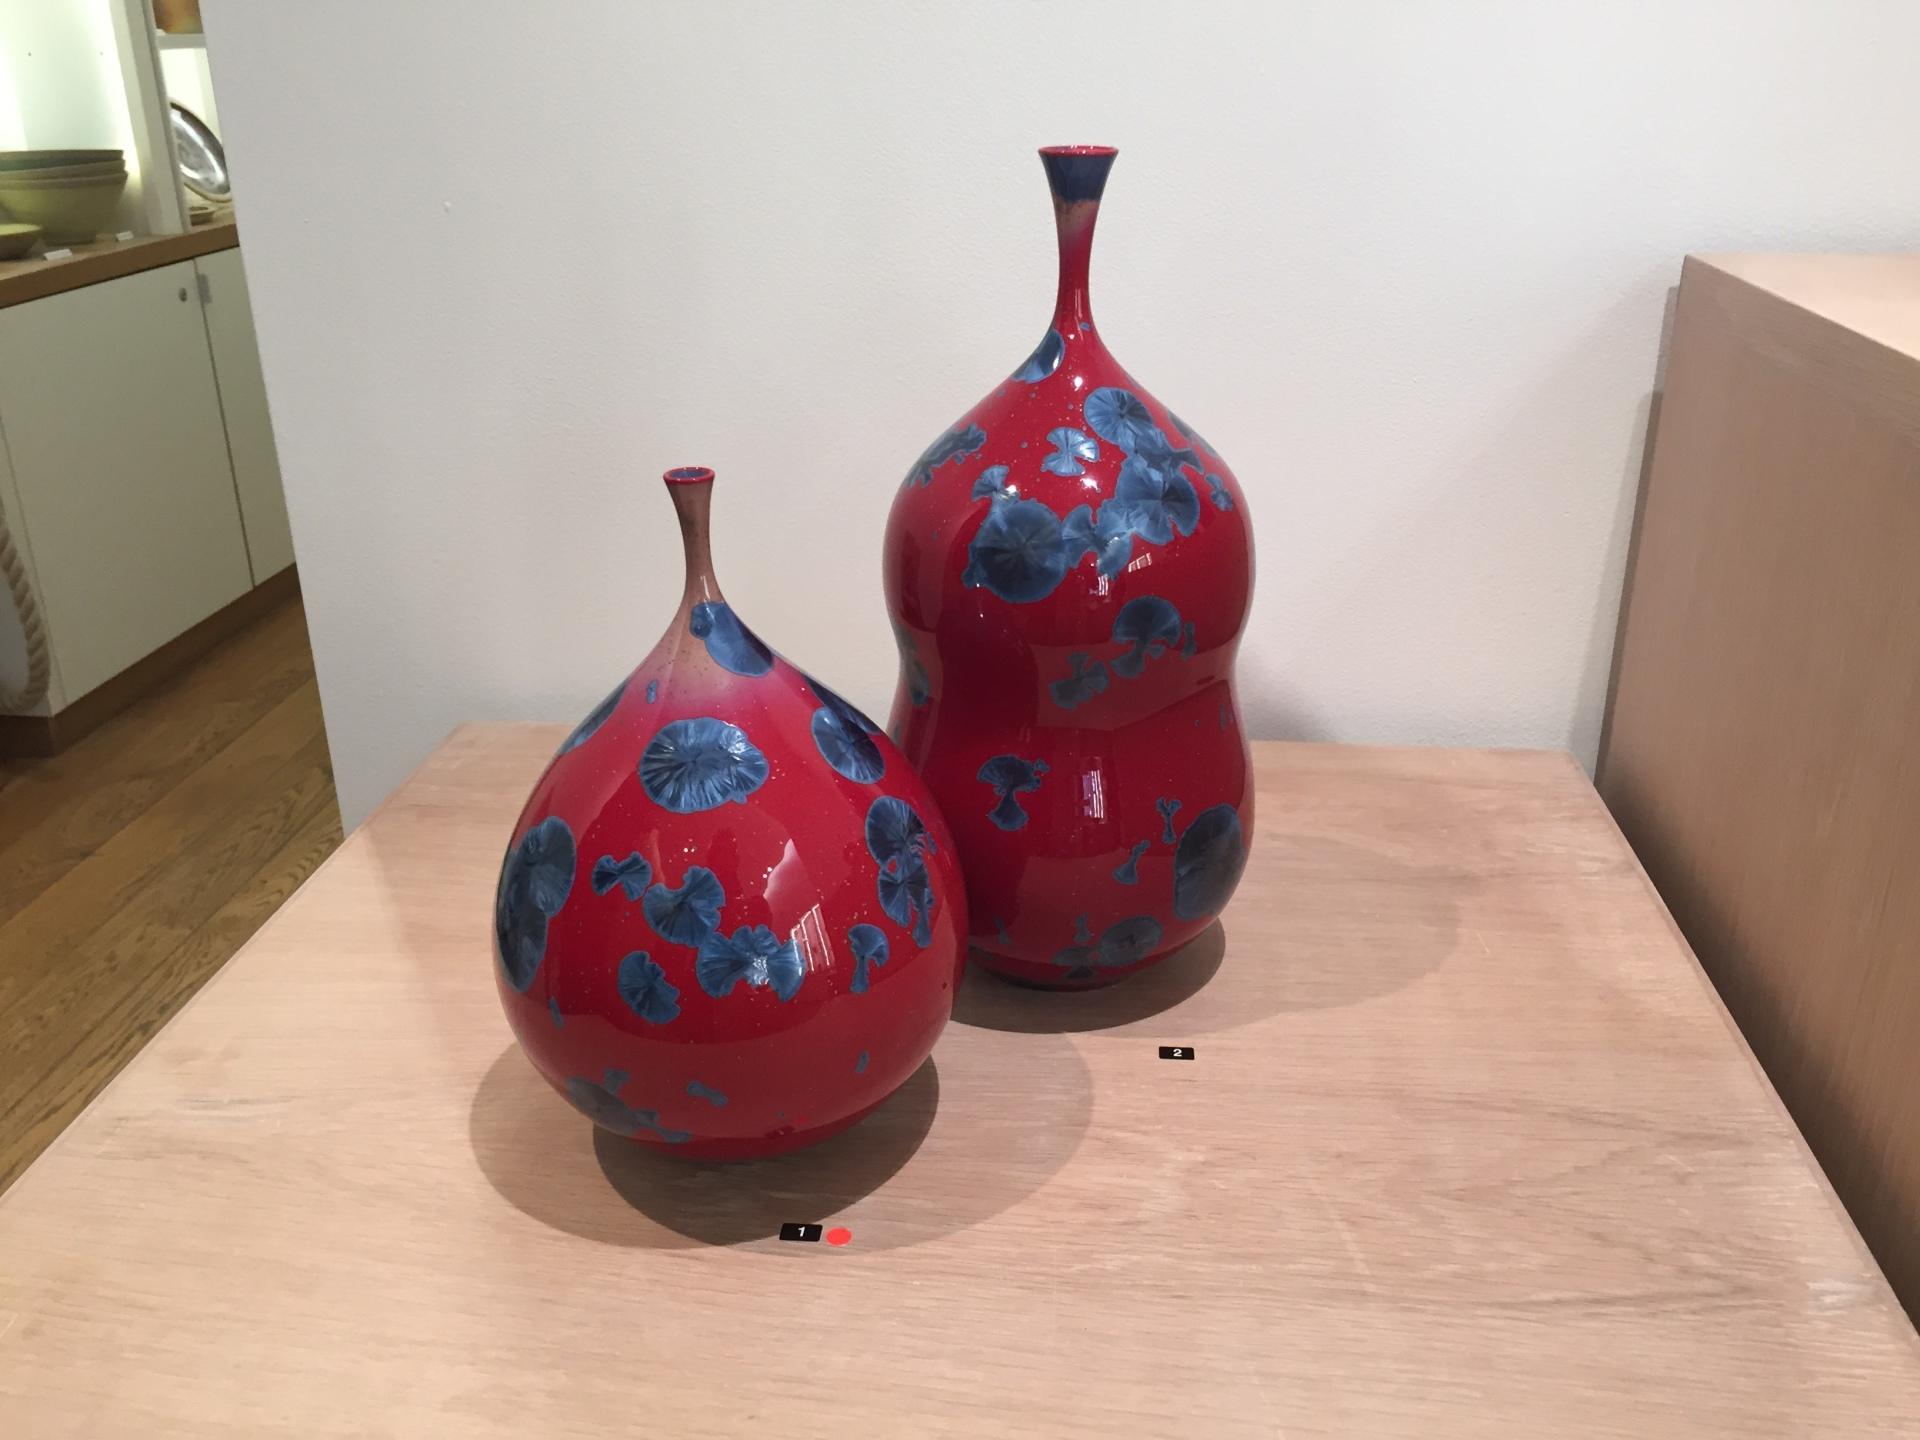 Matt Horne: Red Crystalline vessels